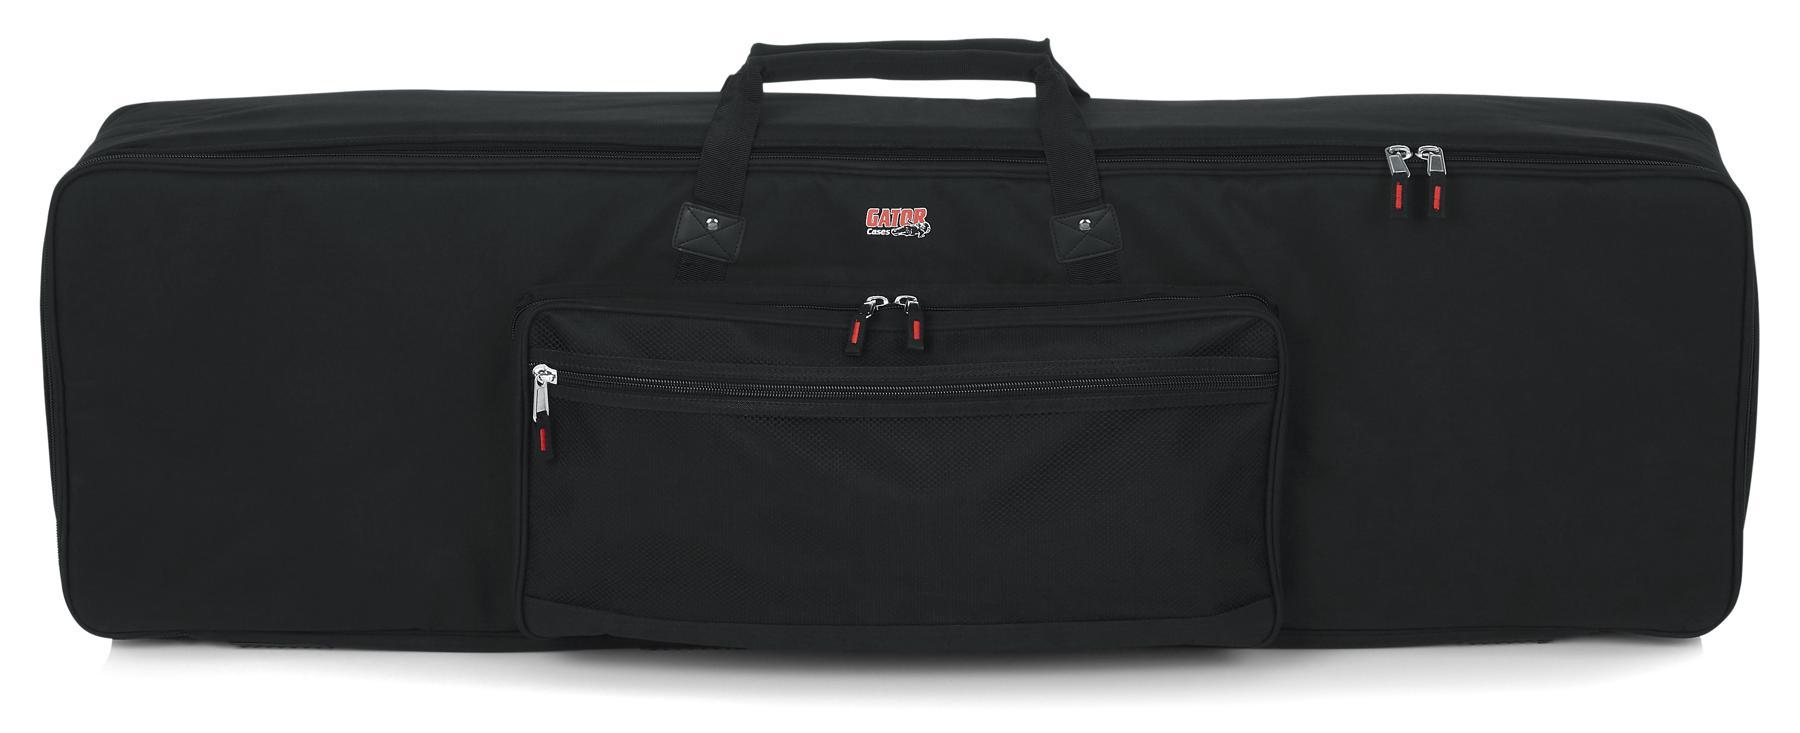 1. Gator Cases Padded Keyboard Gig Bag (GKB-88)